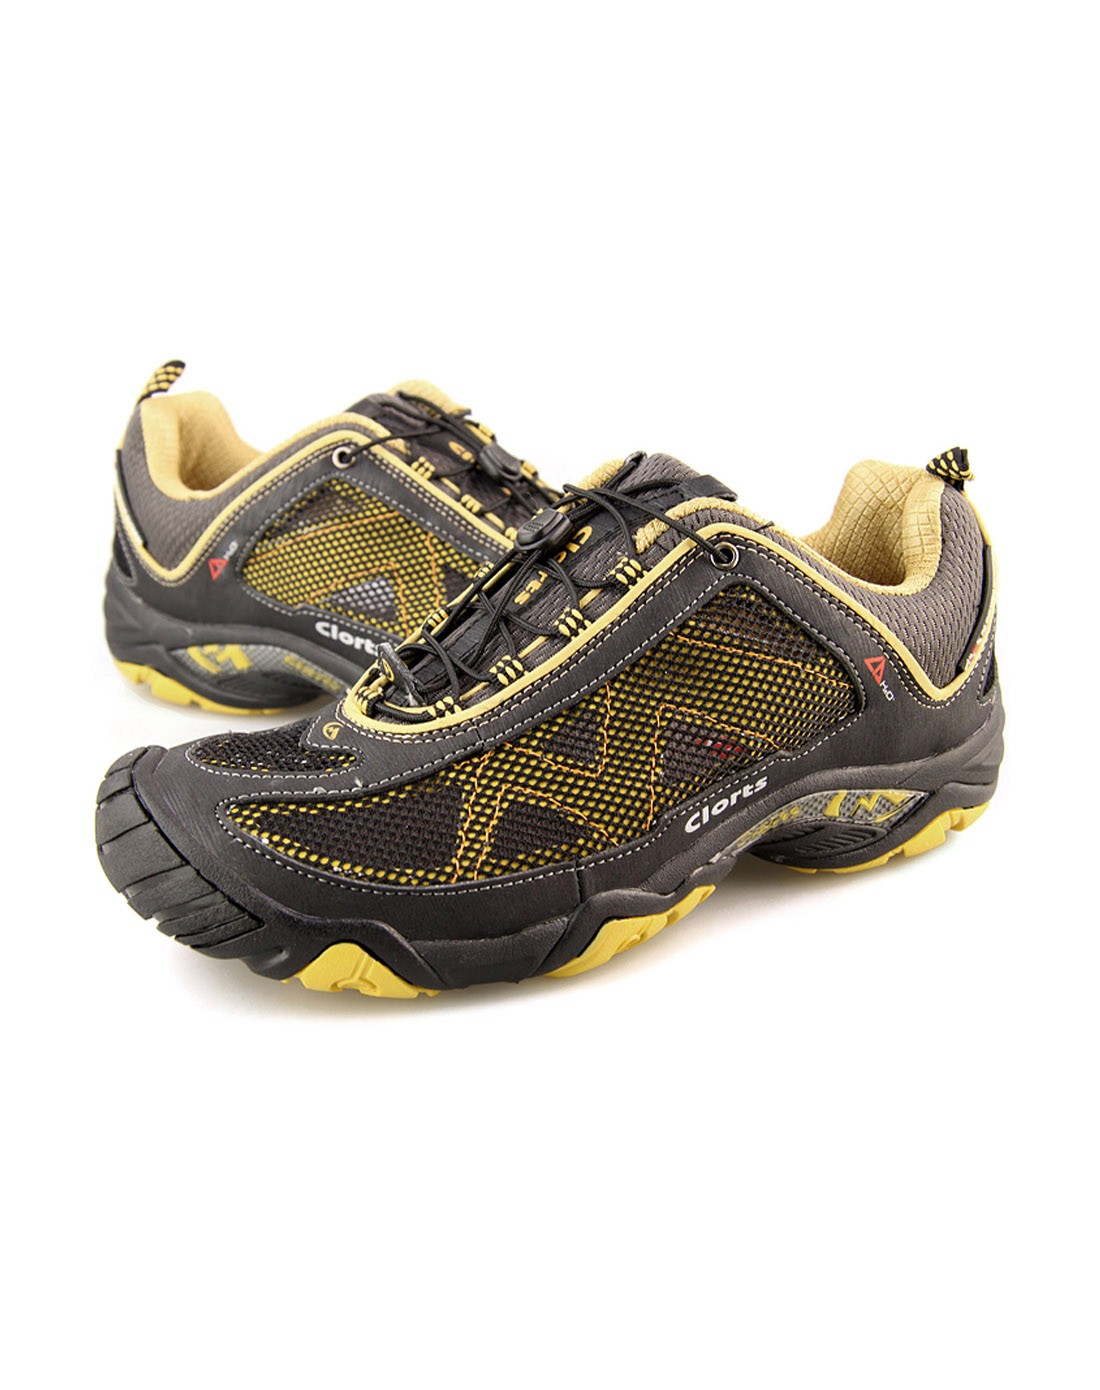 Baby Swim Water Shoes Manufacturers, Baby Swim Water Shoes Factory, Supply Baby Swim Water Shoes